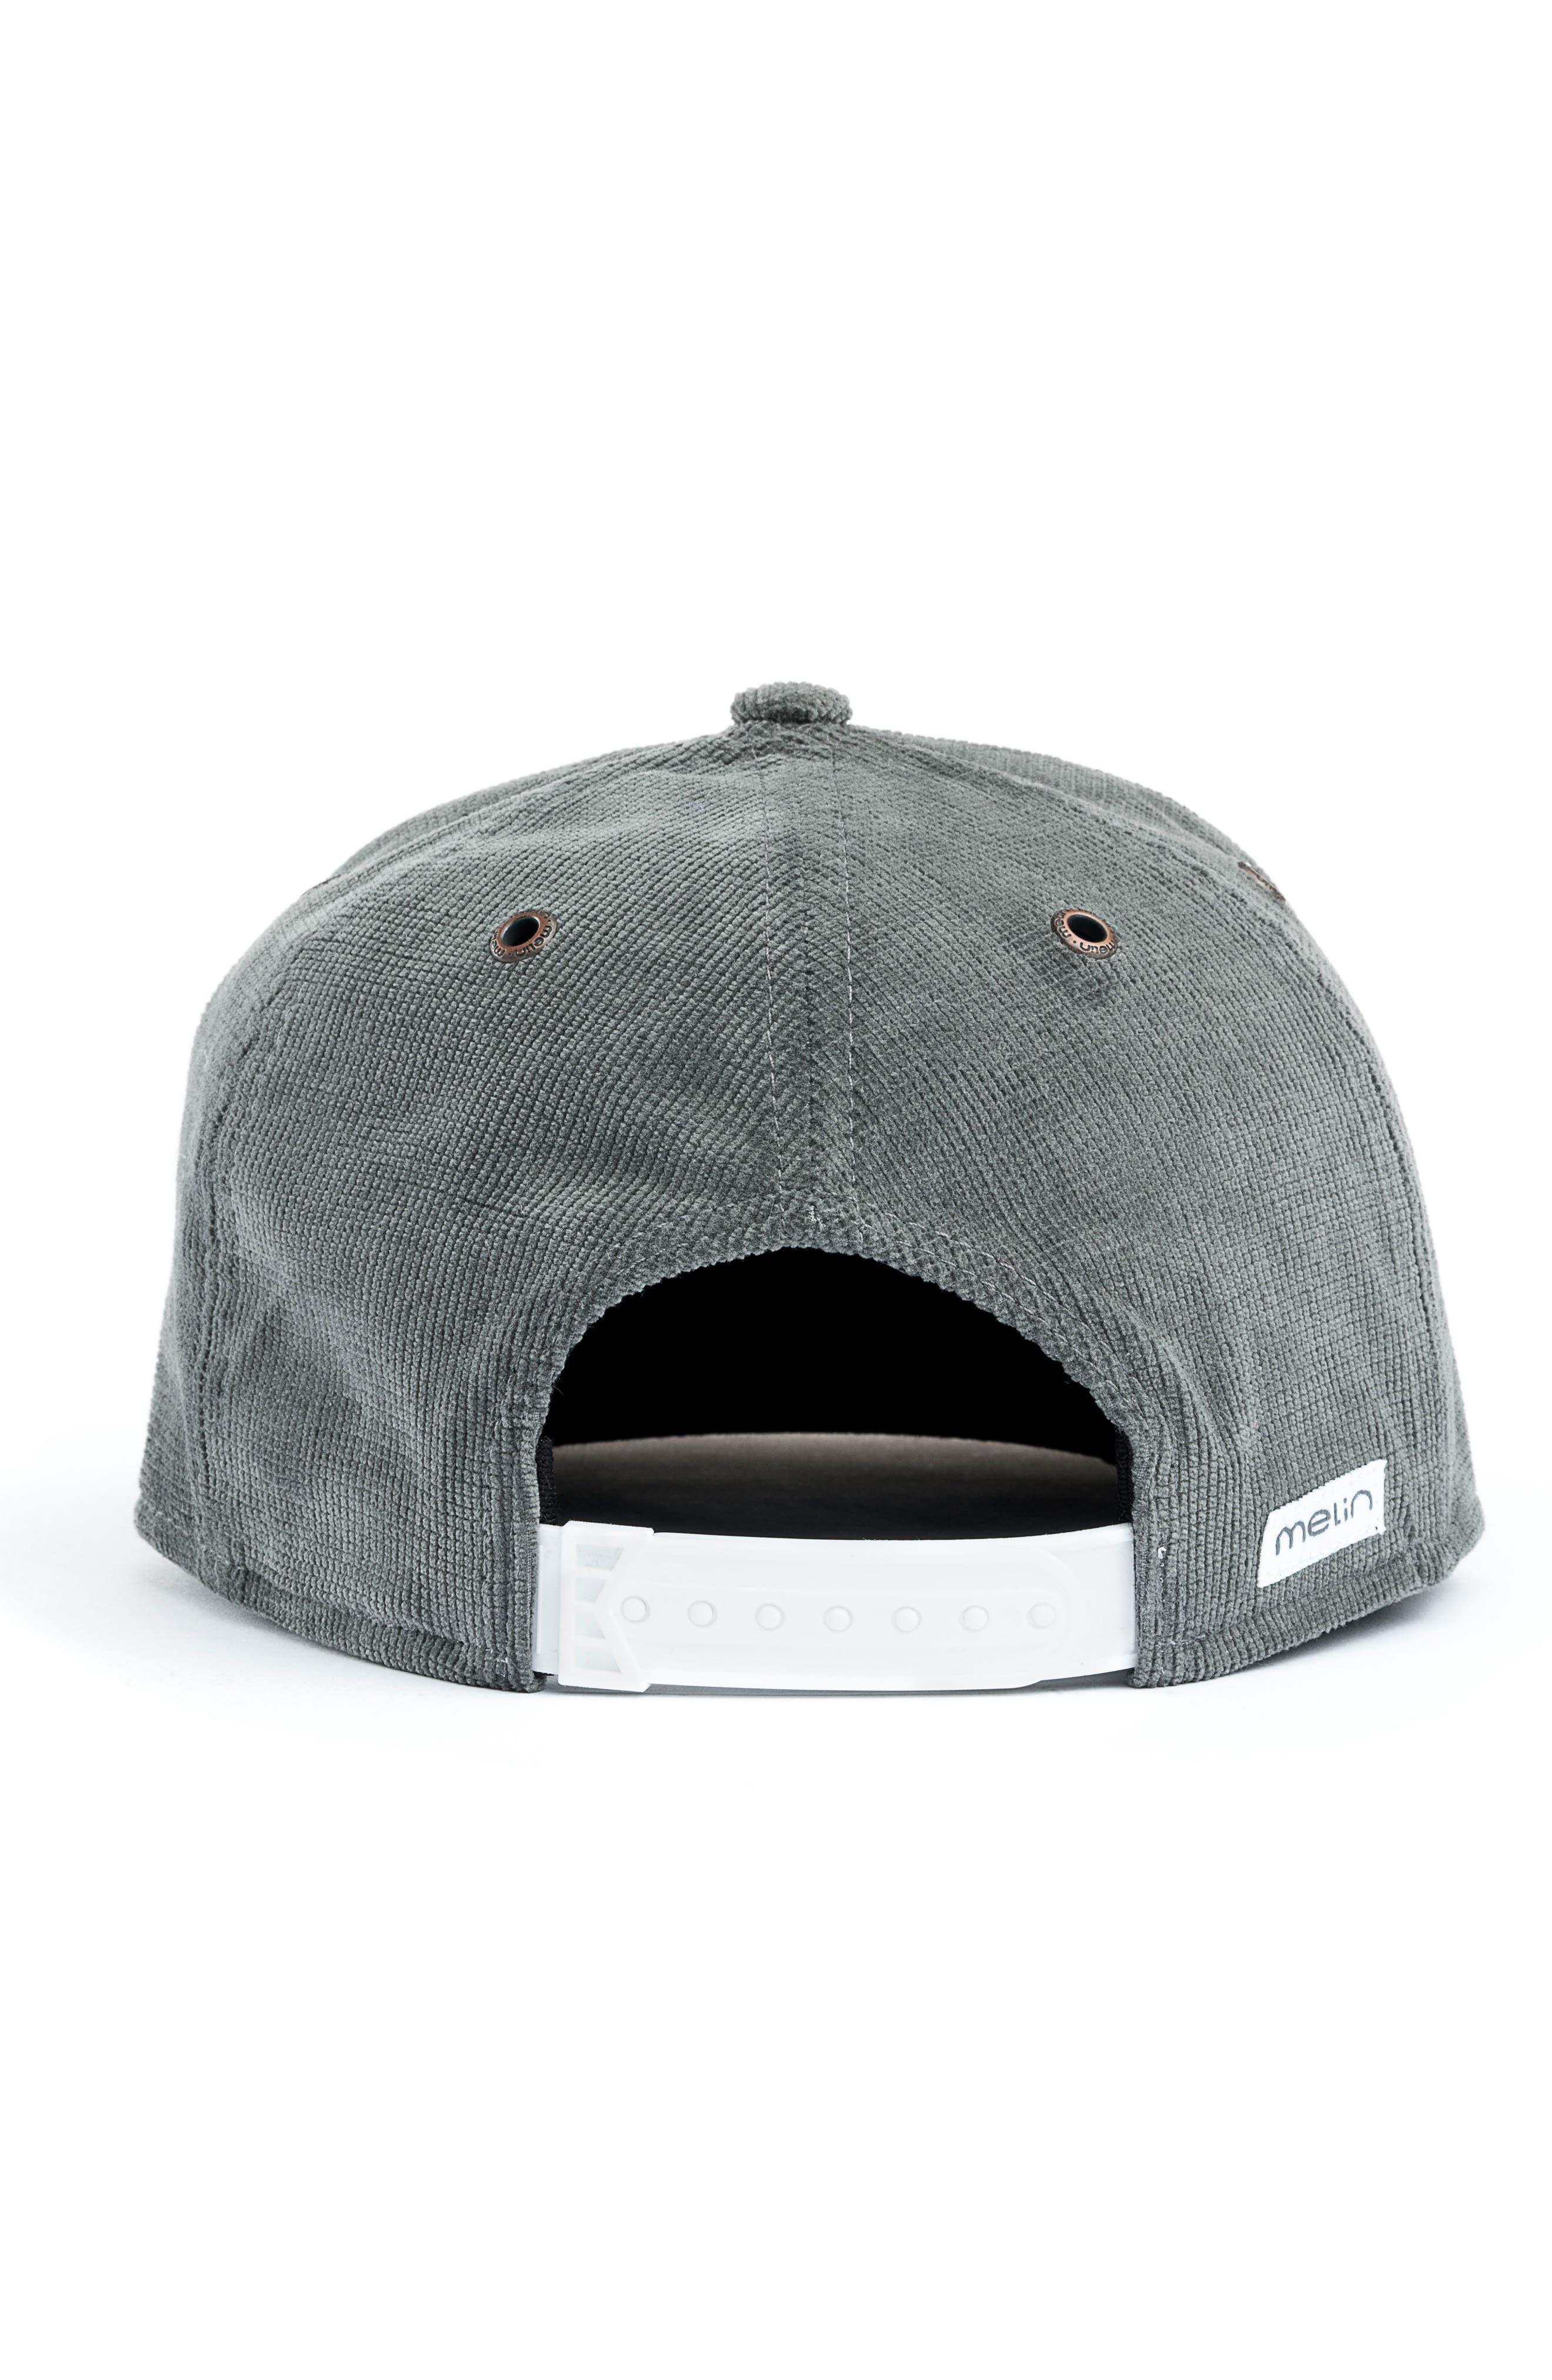 new style e3796 01166 ... shopping melin the stealth snapback baseball cap nordstrom fd368 726f8